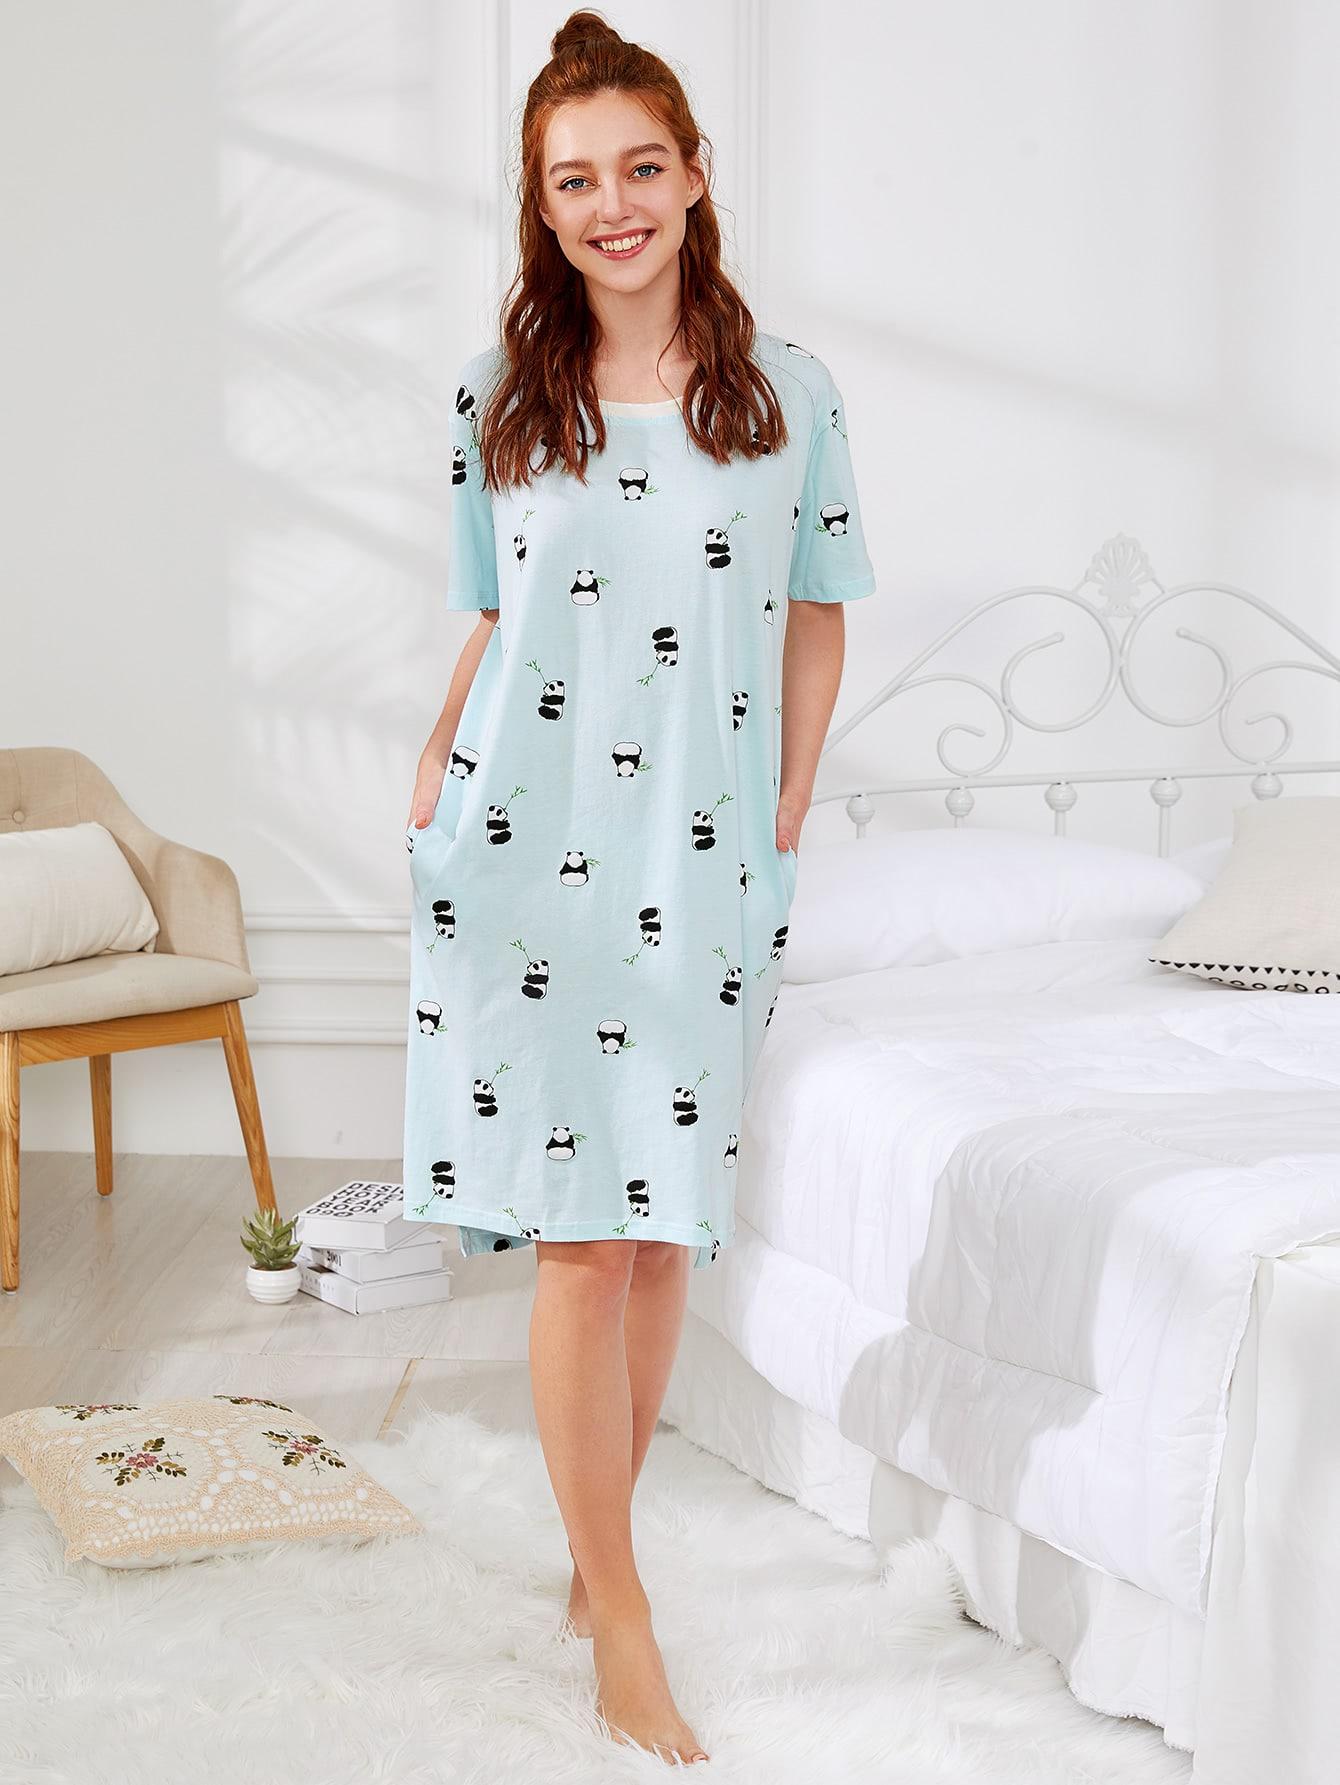 Panda Print Hidden Pocket High Low Nightdress exmork 100 вт 12 в poly si